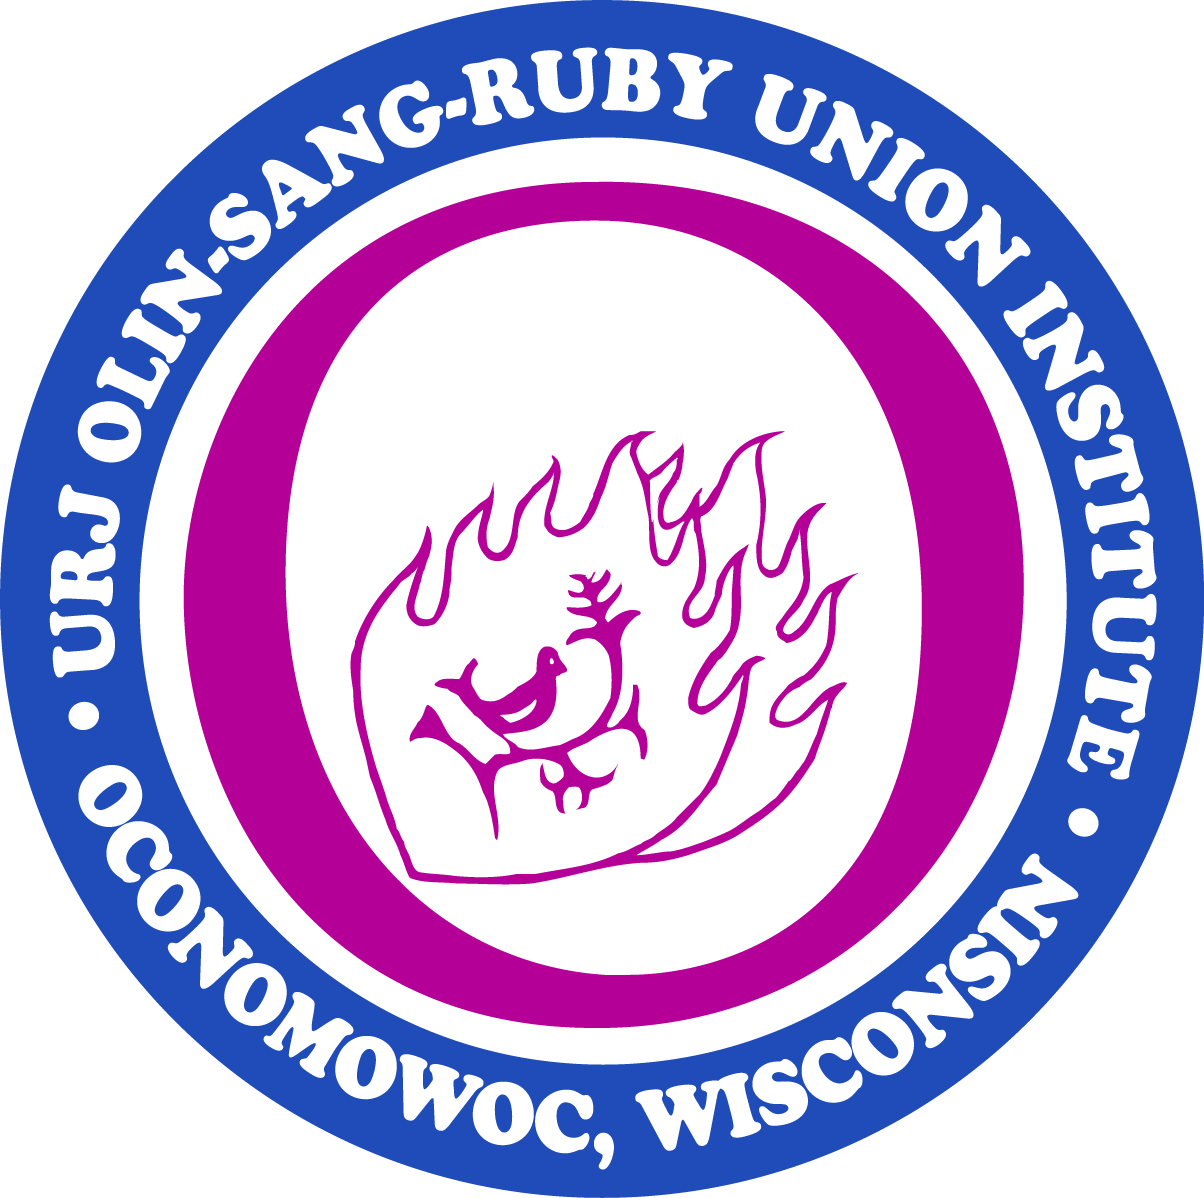 OSRUI Circle Logo Color JPeg.jpg